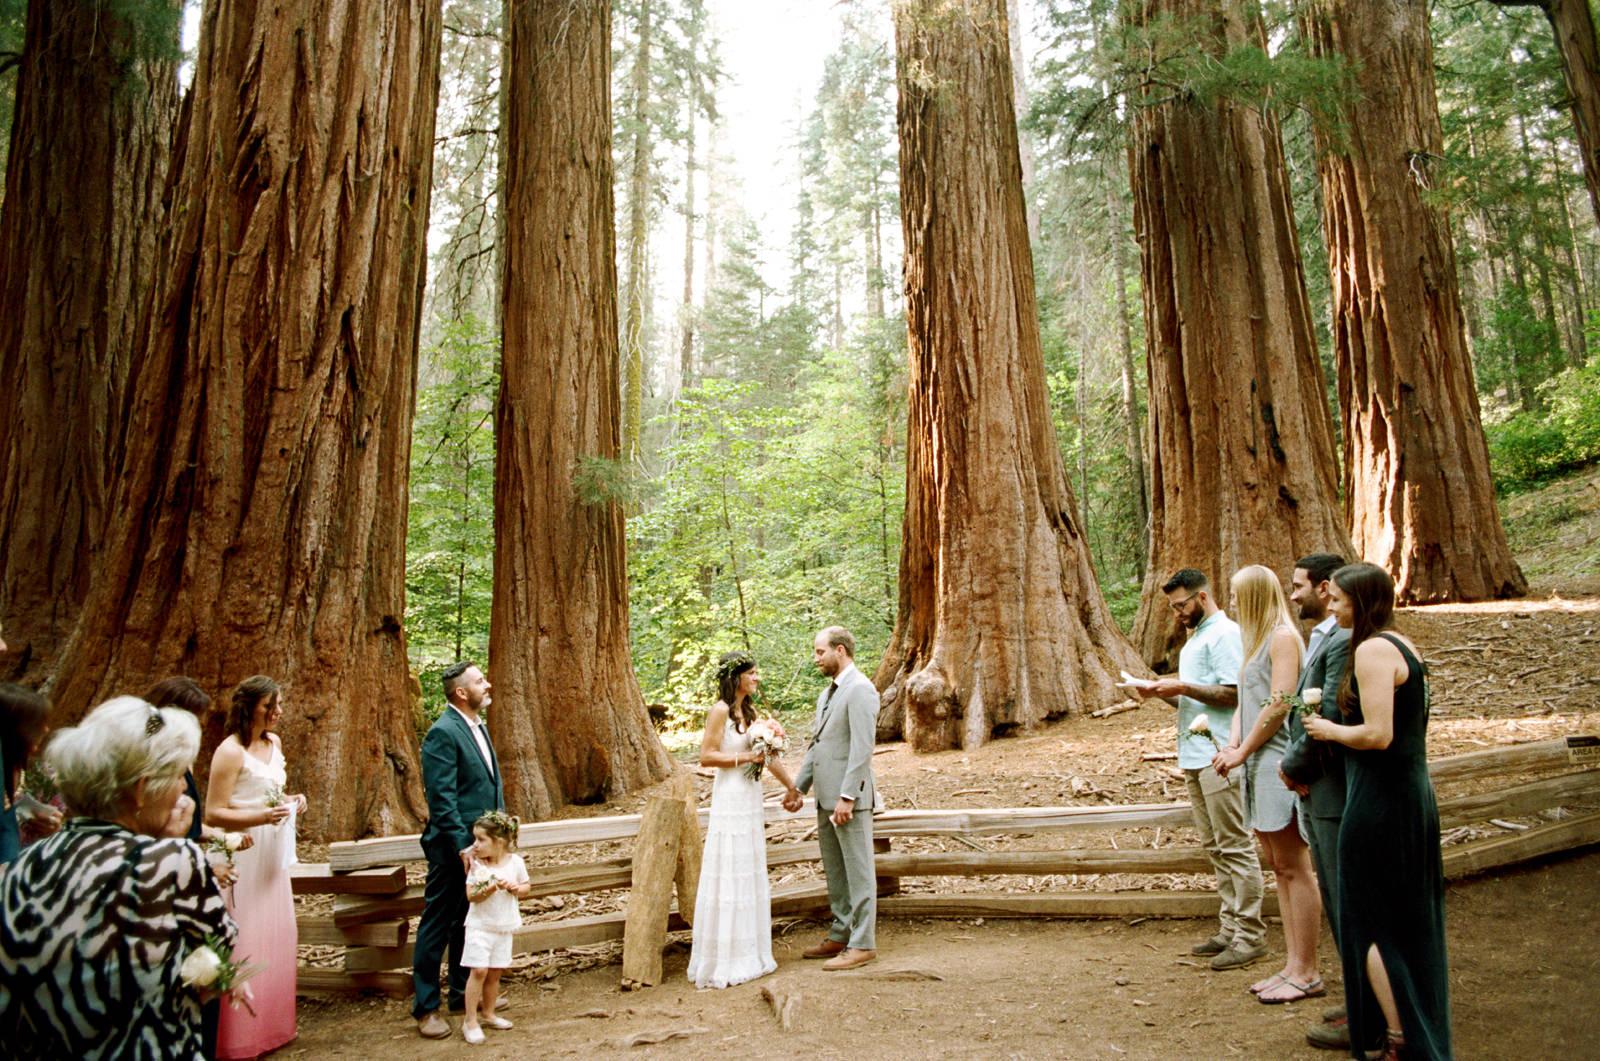 yosemite-intimate-wedding-049 YOSEMITE INTIMATE WEDDING